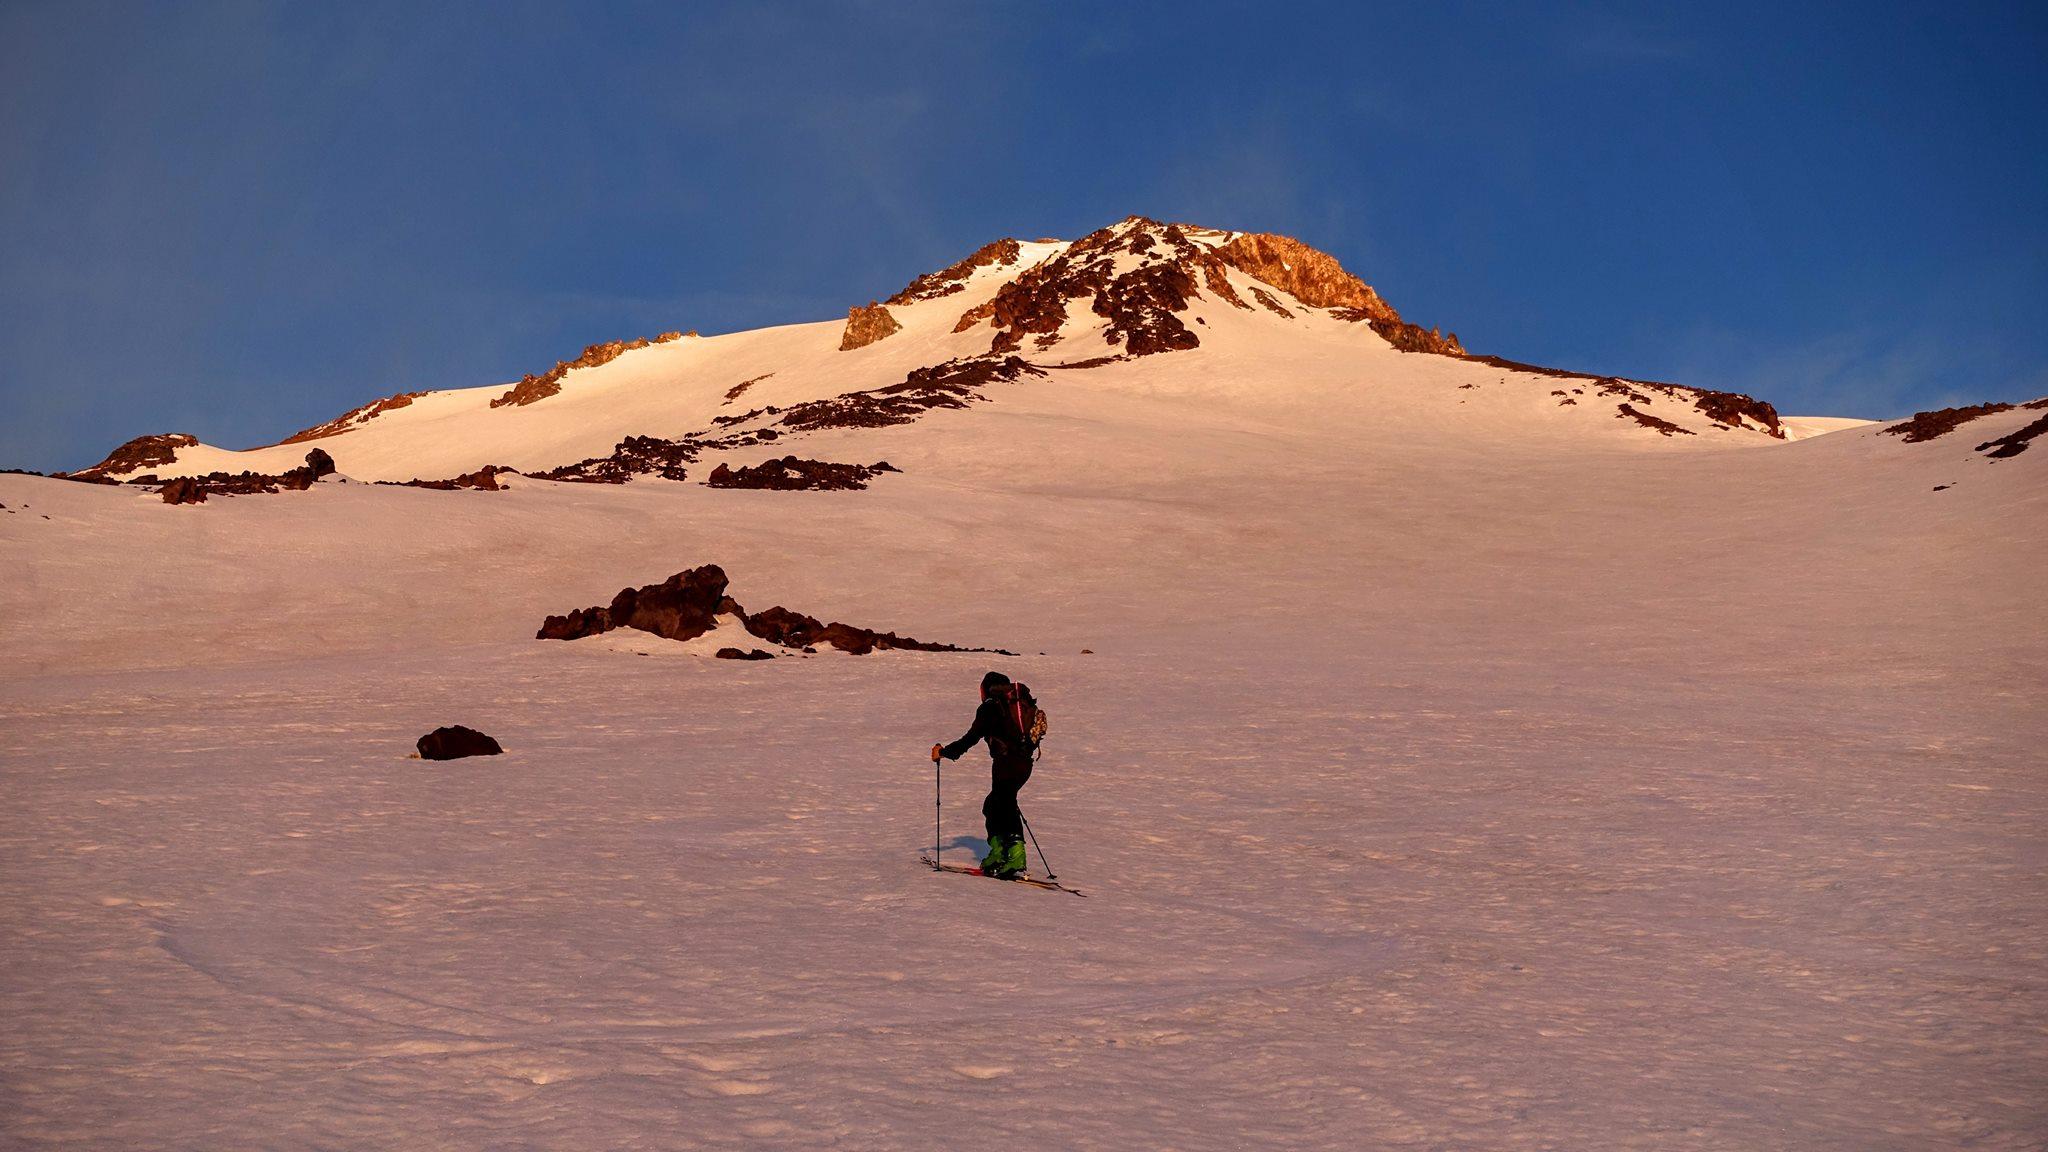 Trip Report: Mt. Shasta Ski Mountaineering